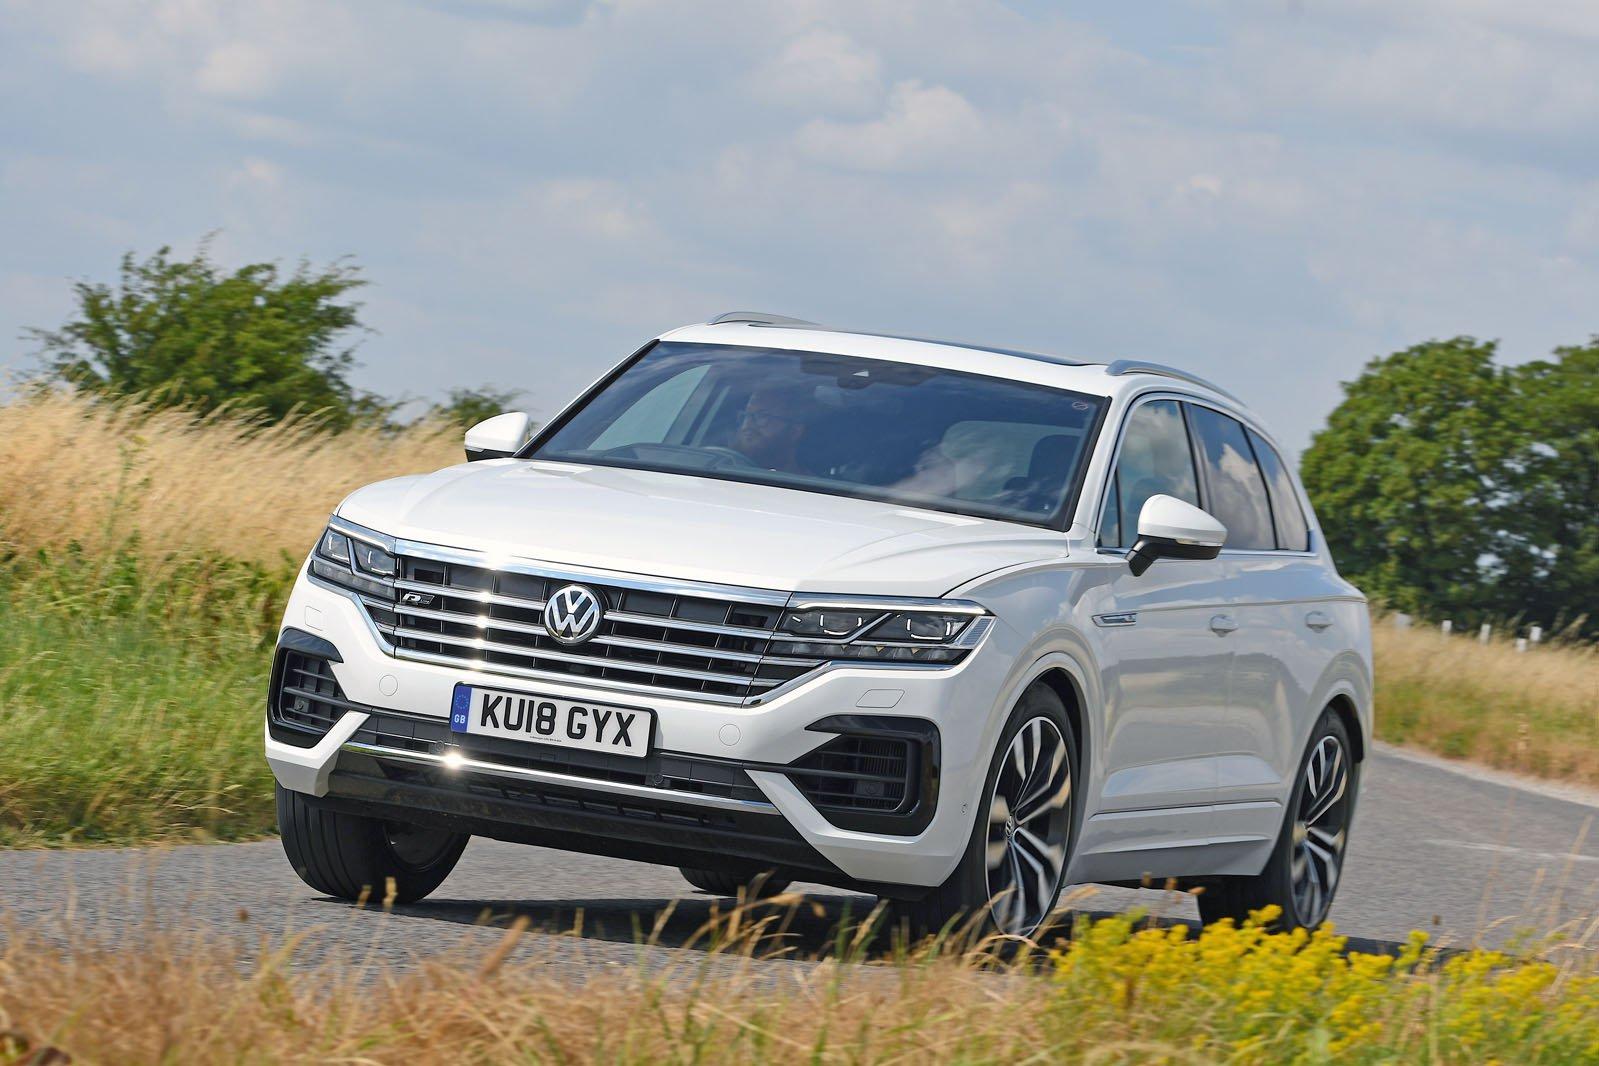 Volkswagen Touareg 2019 cornering shot